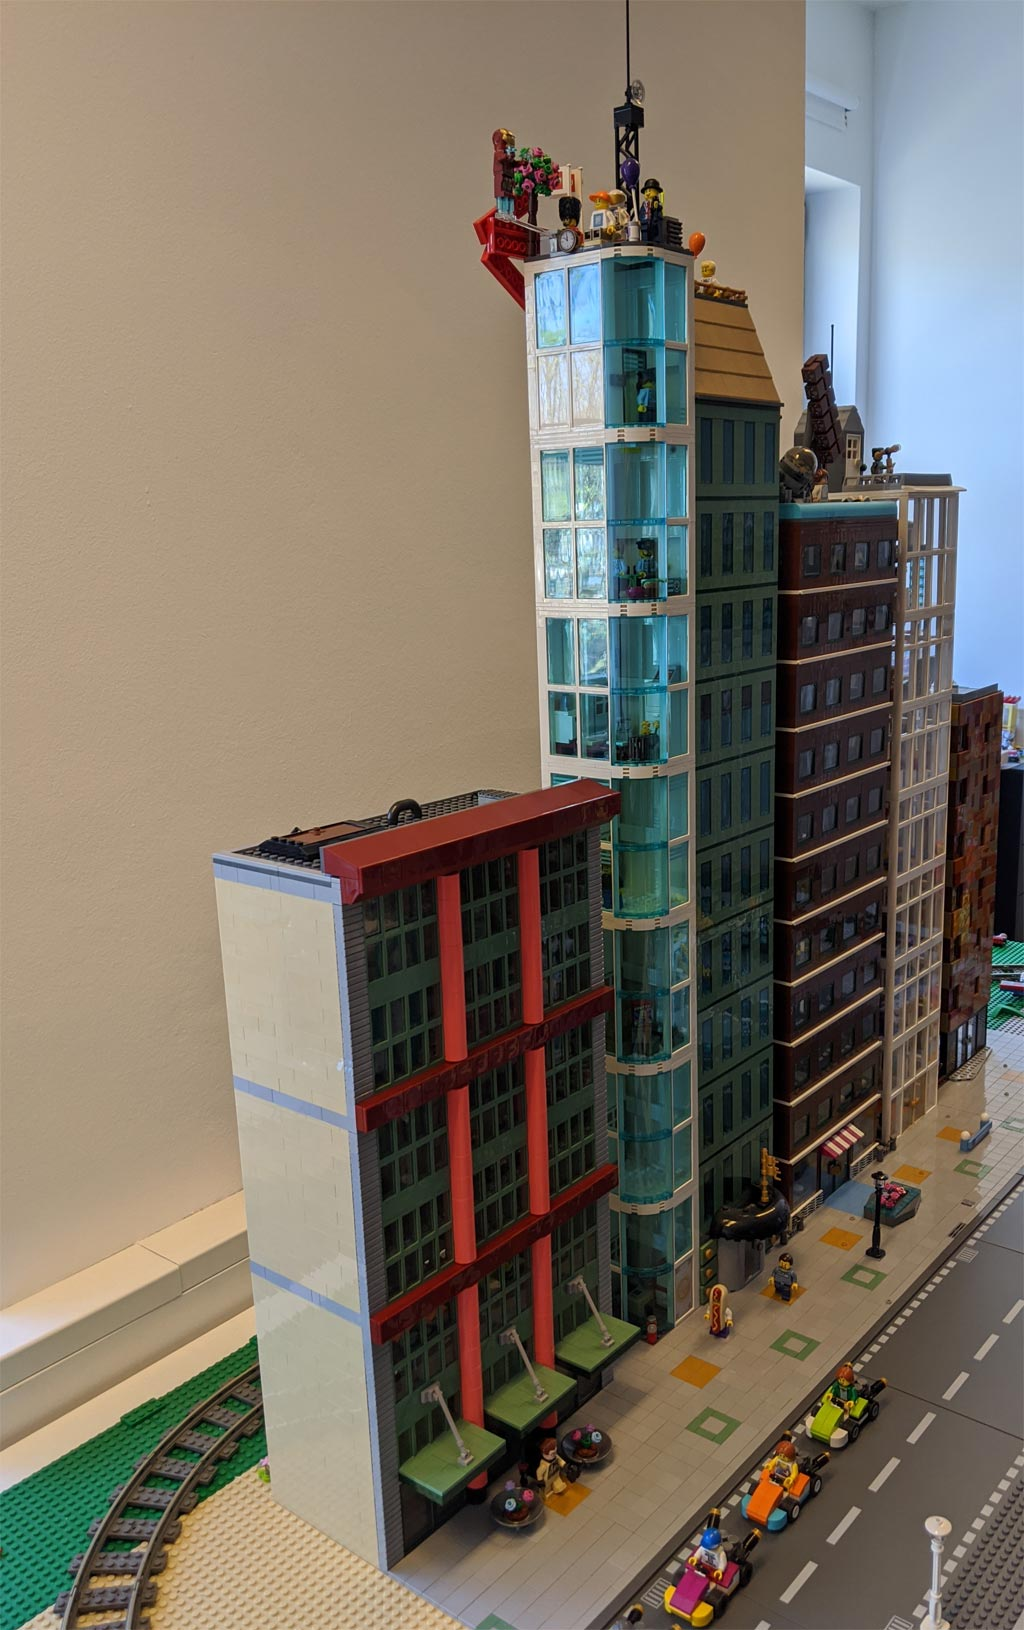 hochhaeuser-fith-avenue-new-ukonio-city-2020-zusammengebaut-andres-lehmann zusammengebautcom